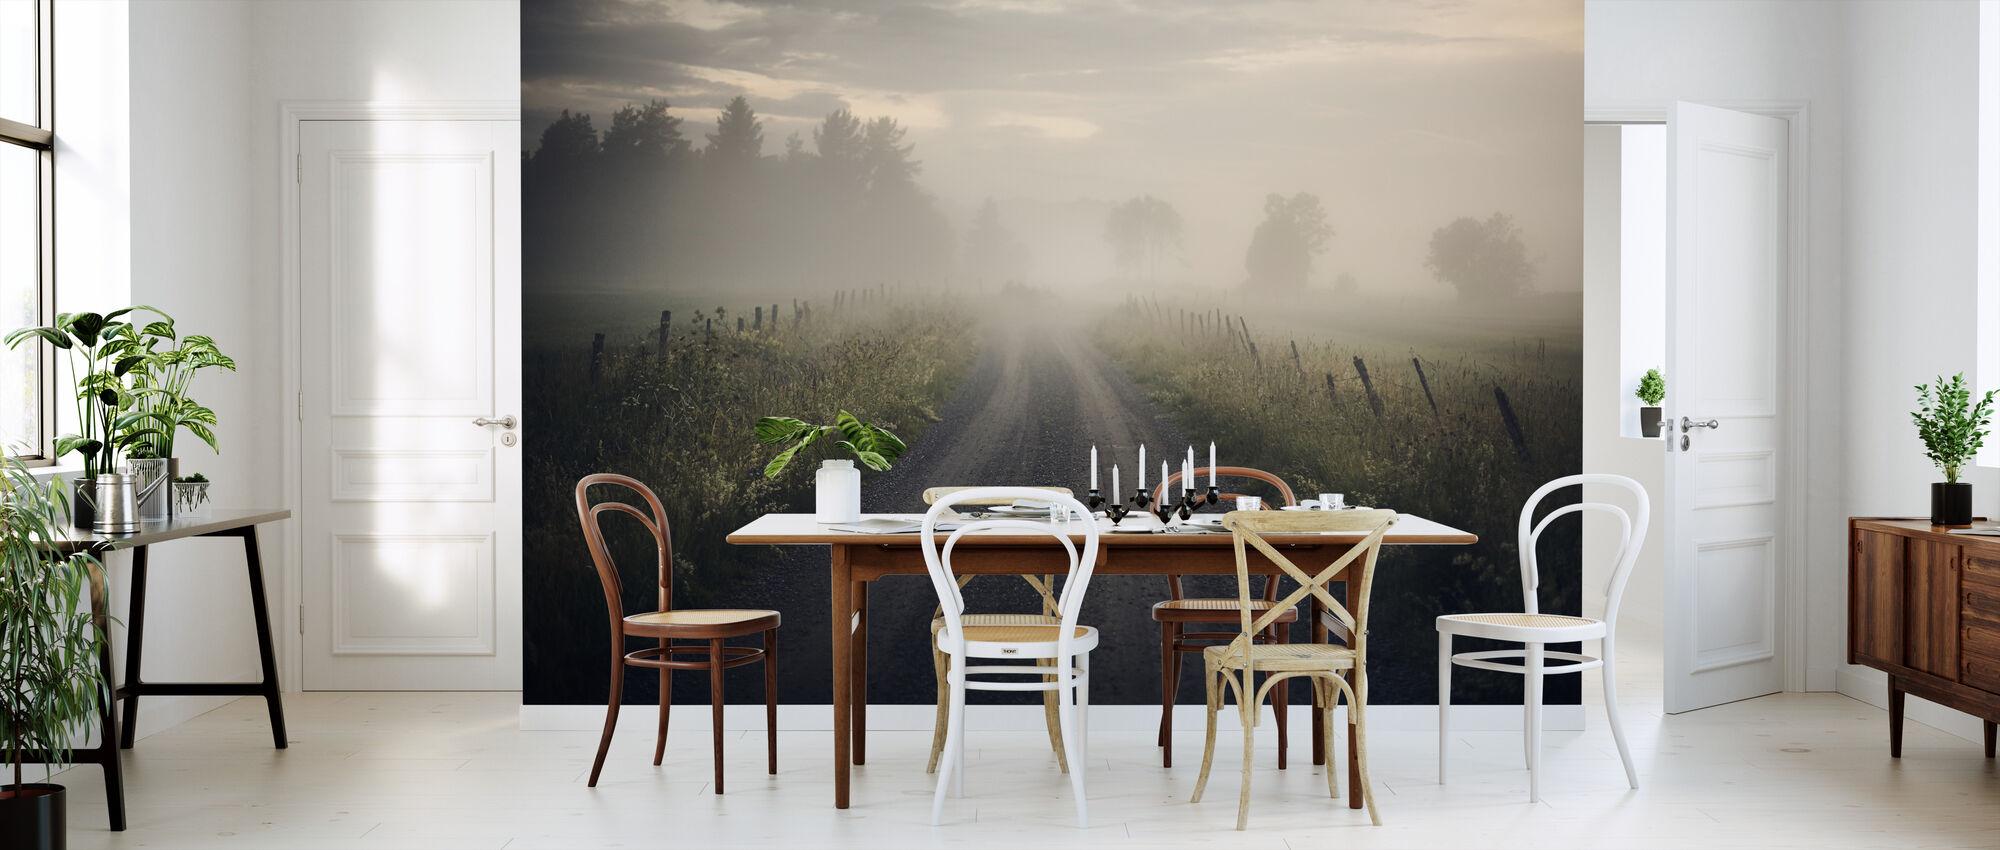 Misty Rural Road - Wallpaper - Kitchen